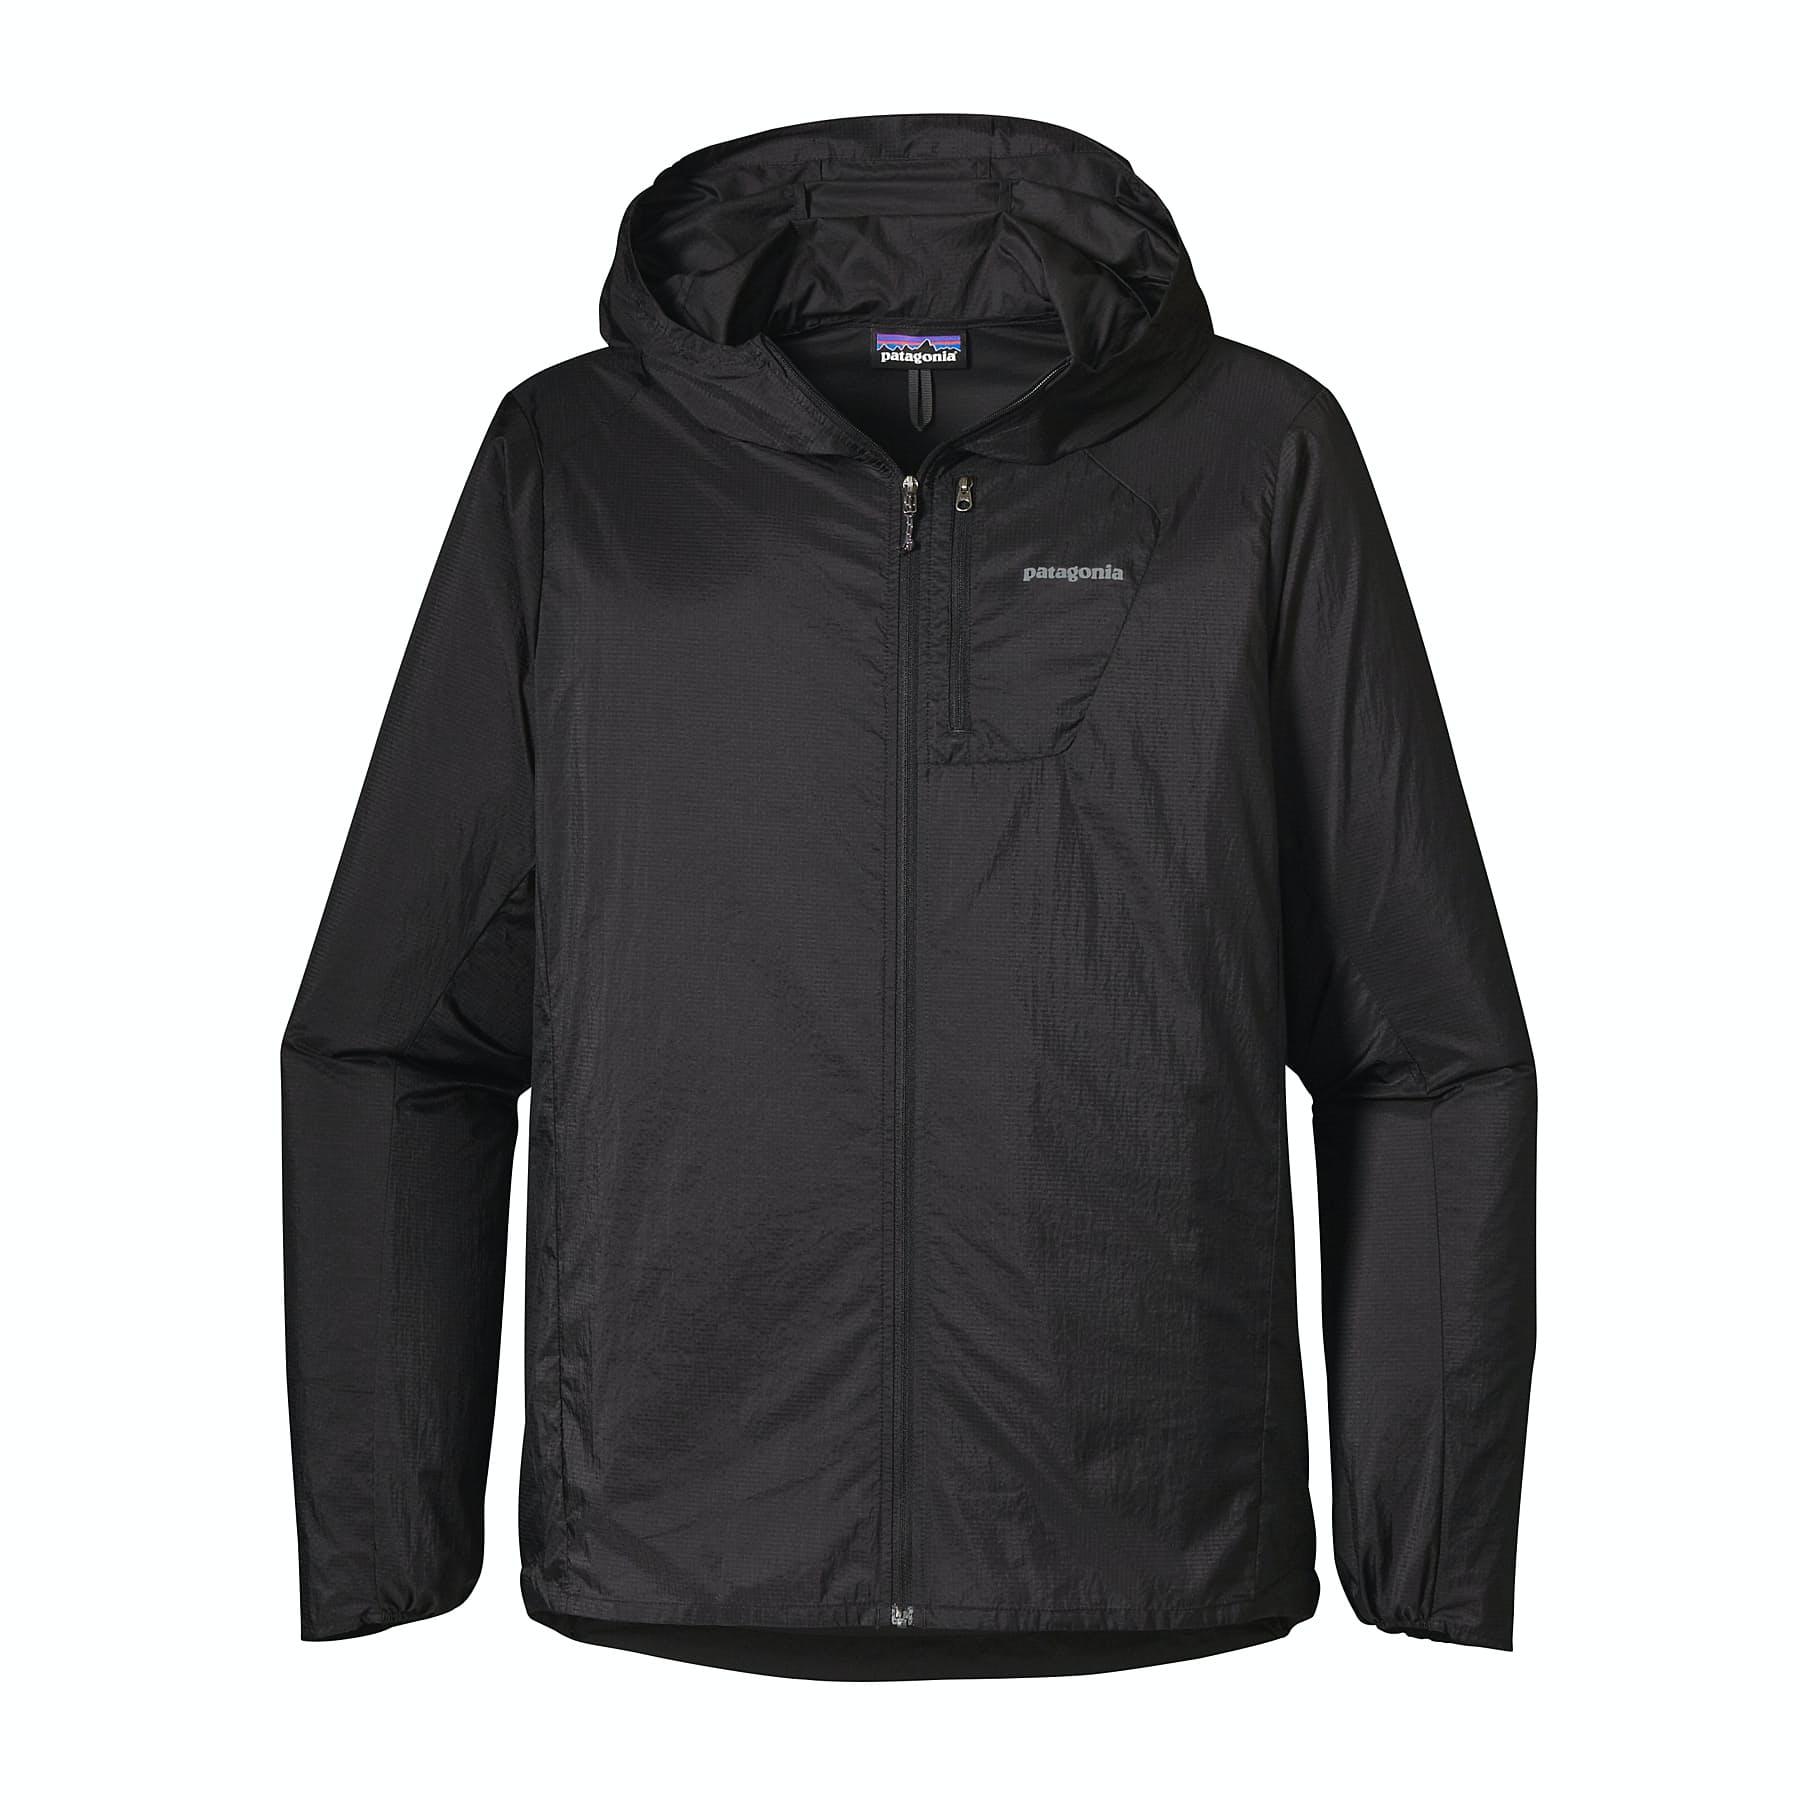 92kzxdqqkg patagonia houdini jacket 0 original